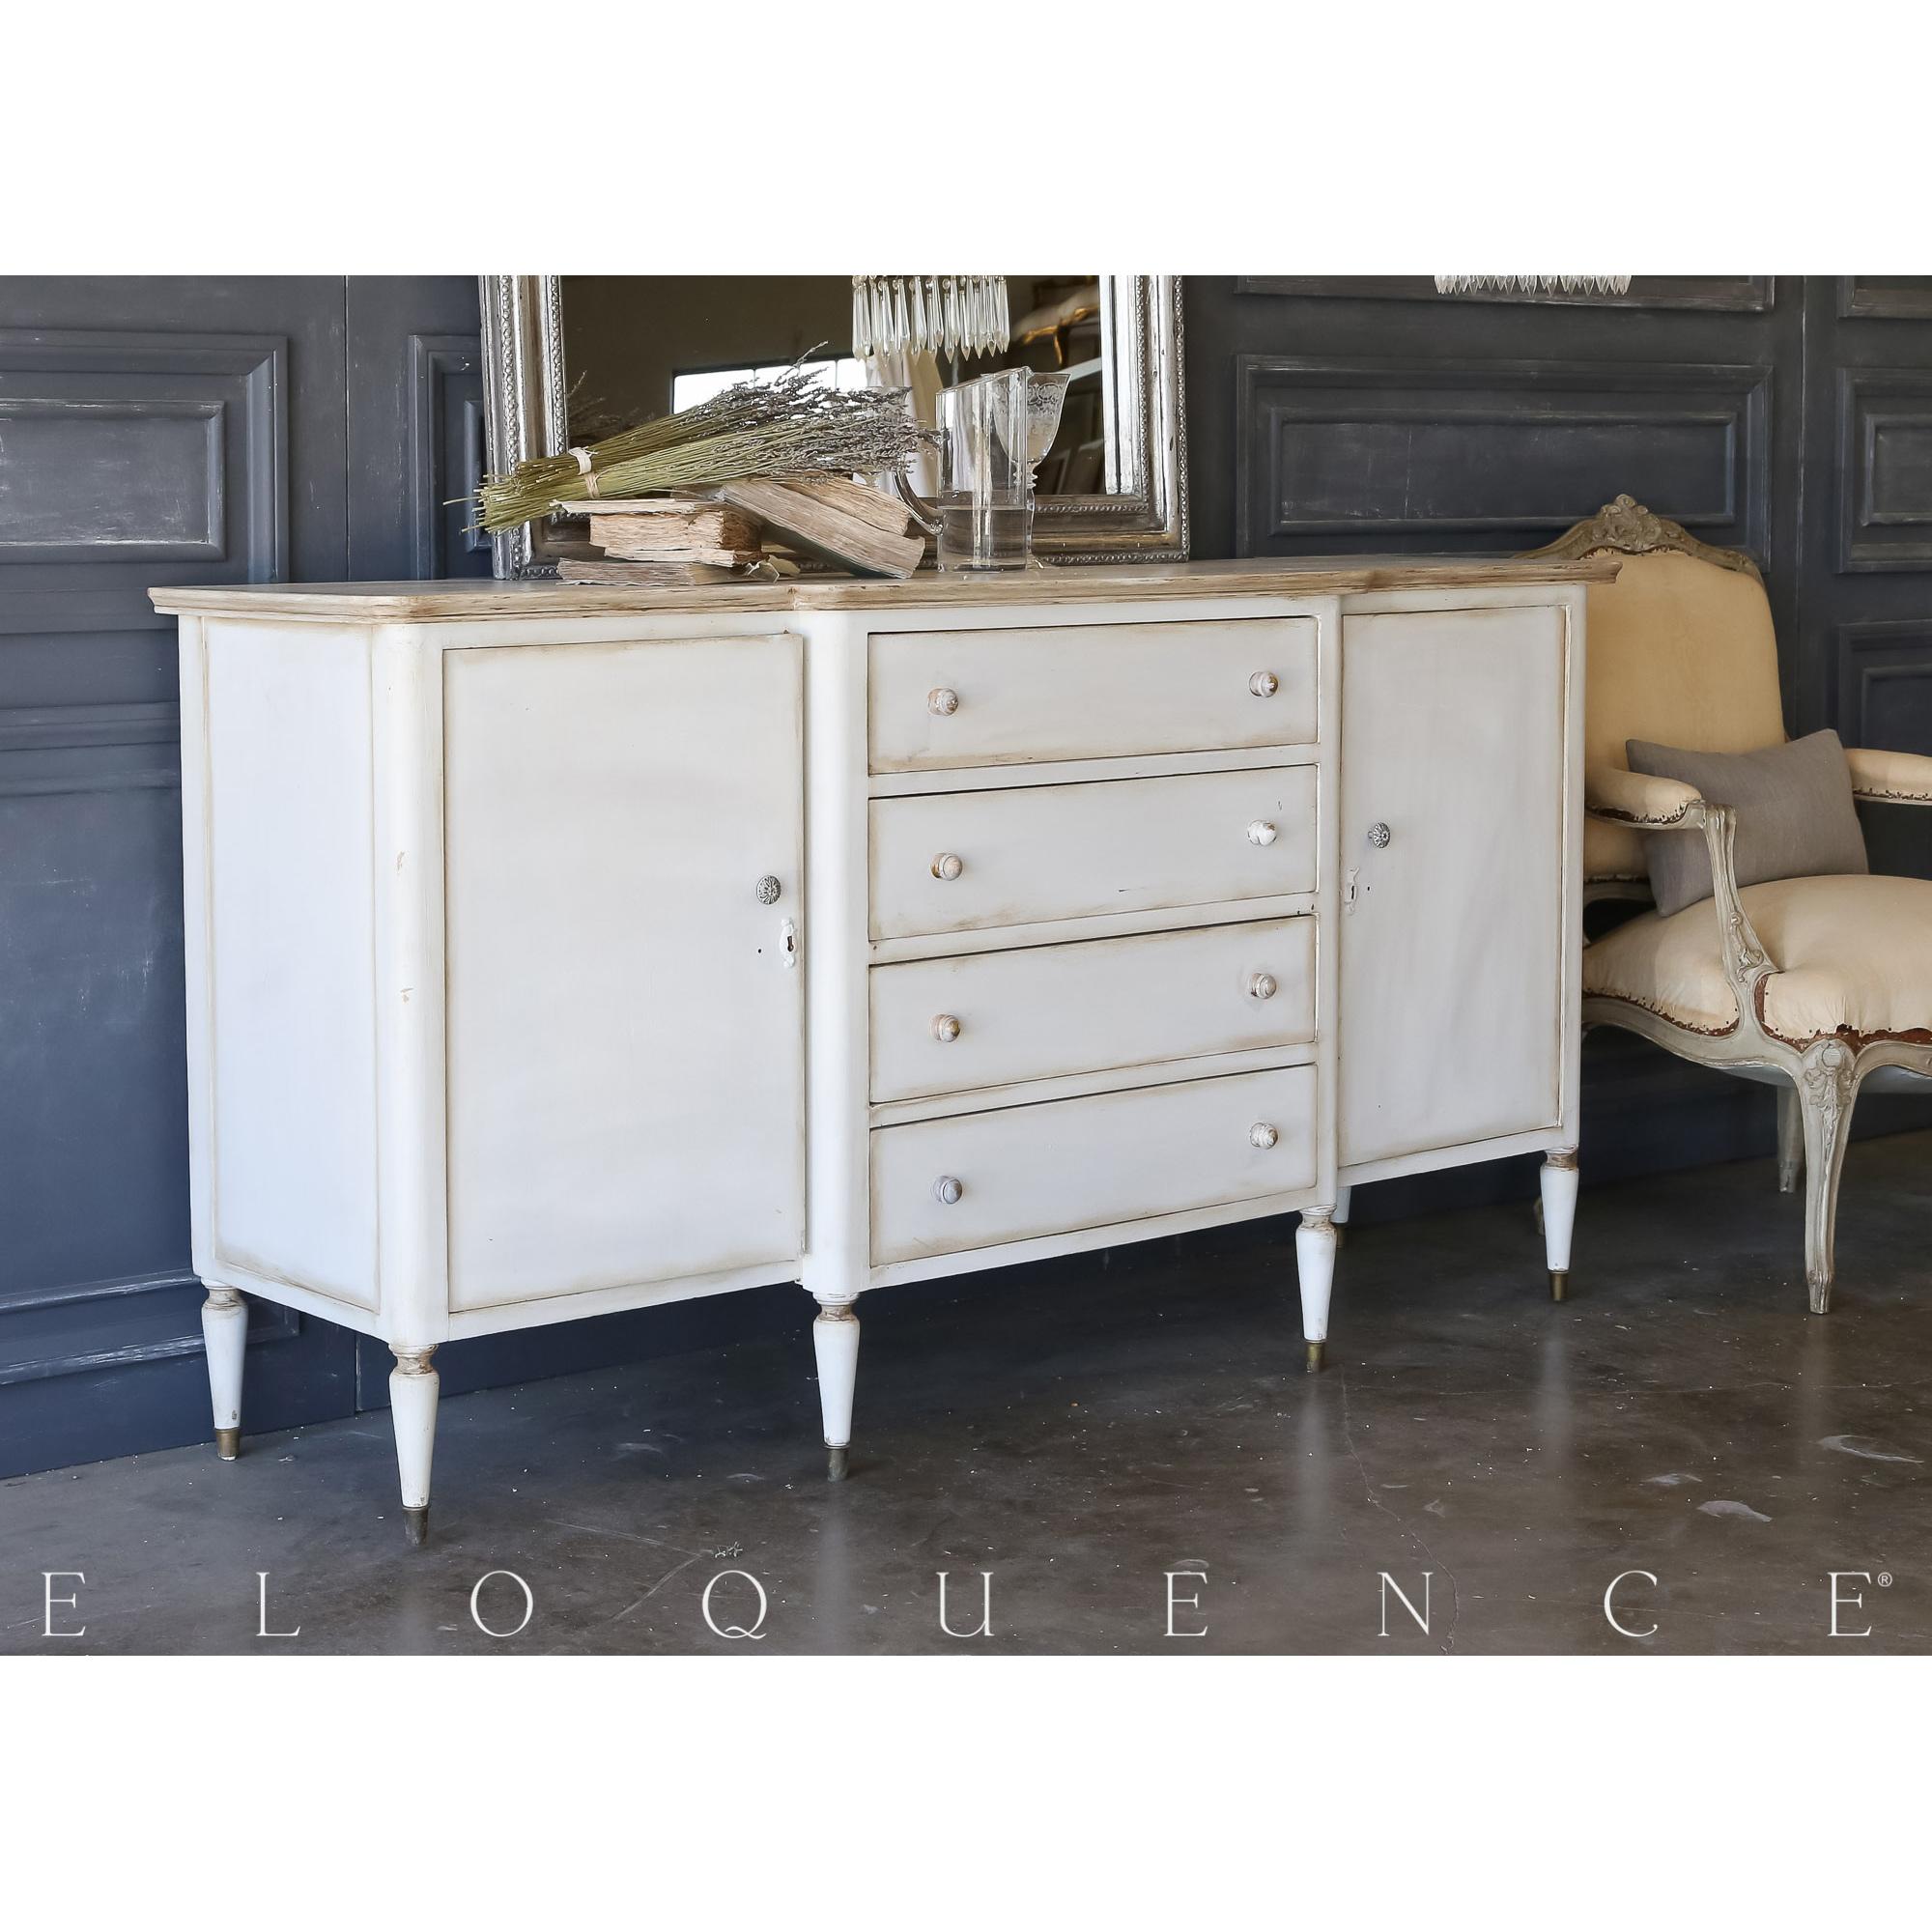 Eloquence® Vintage Pale Grey Sideboard: 1940